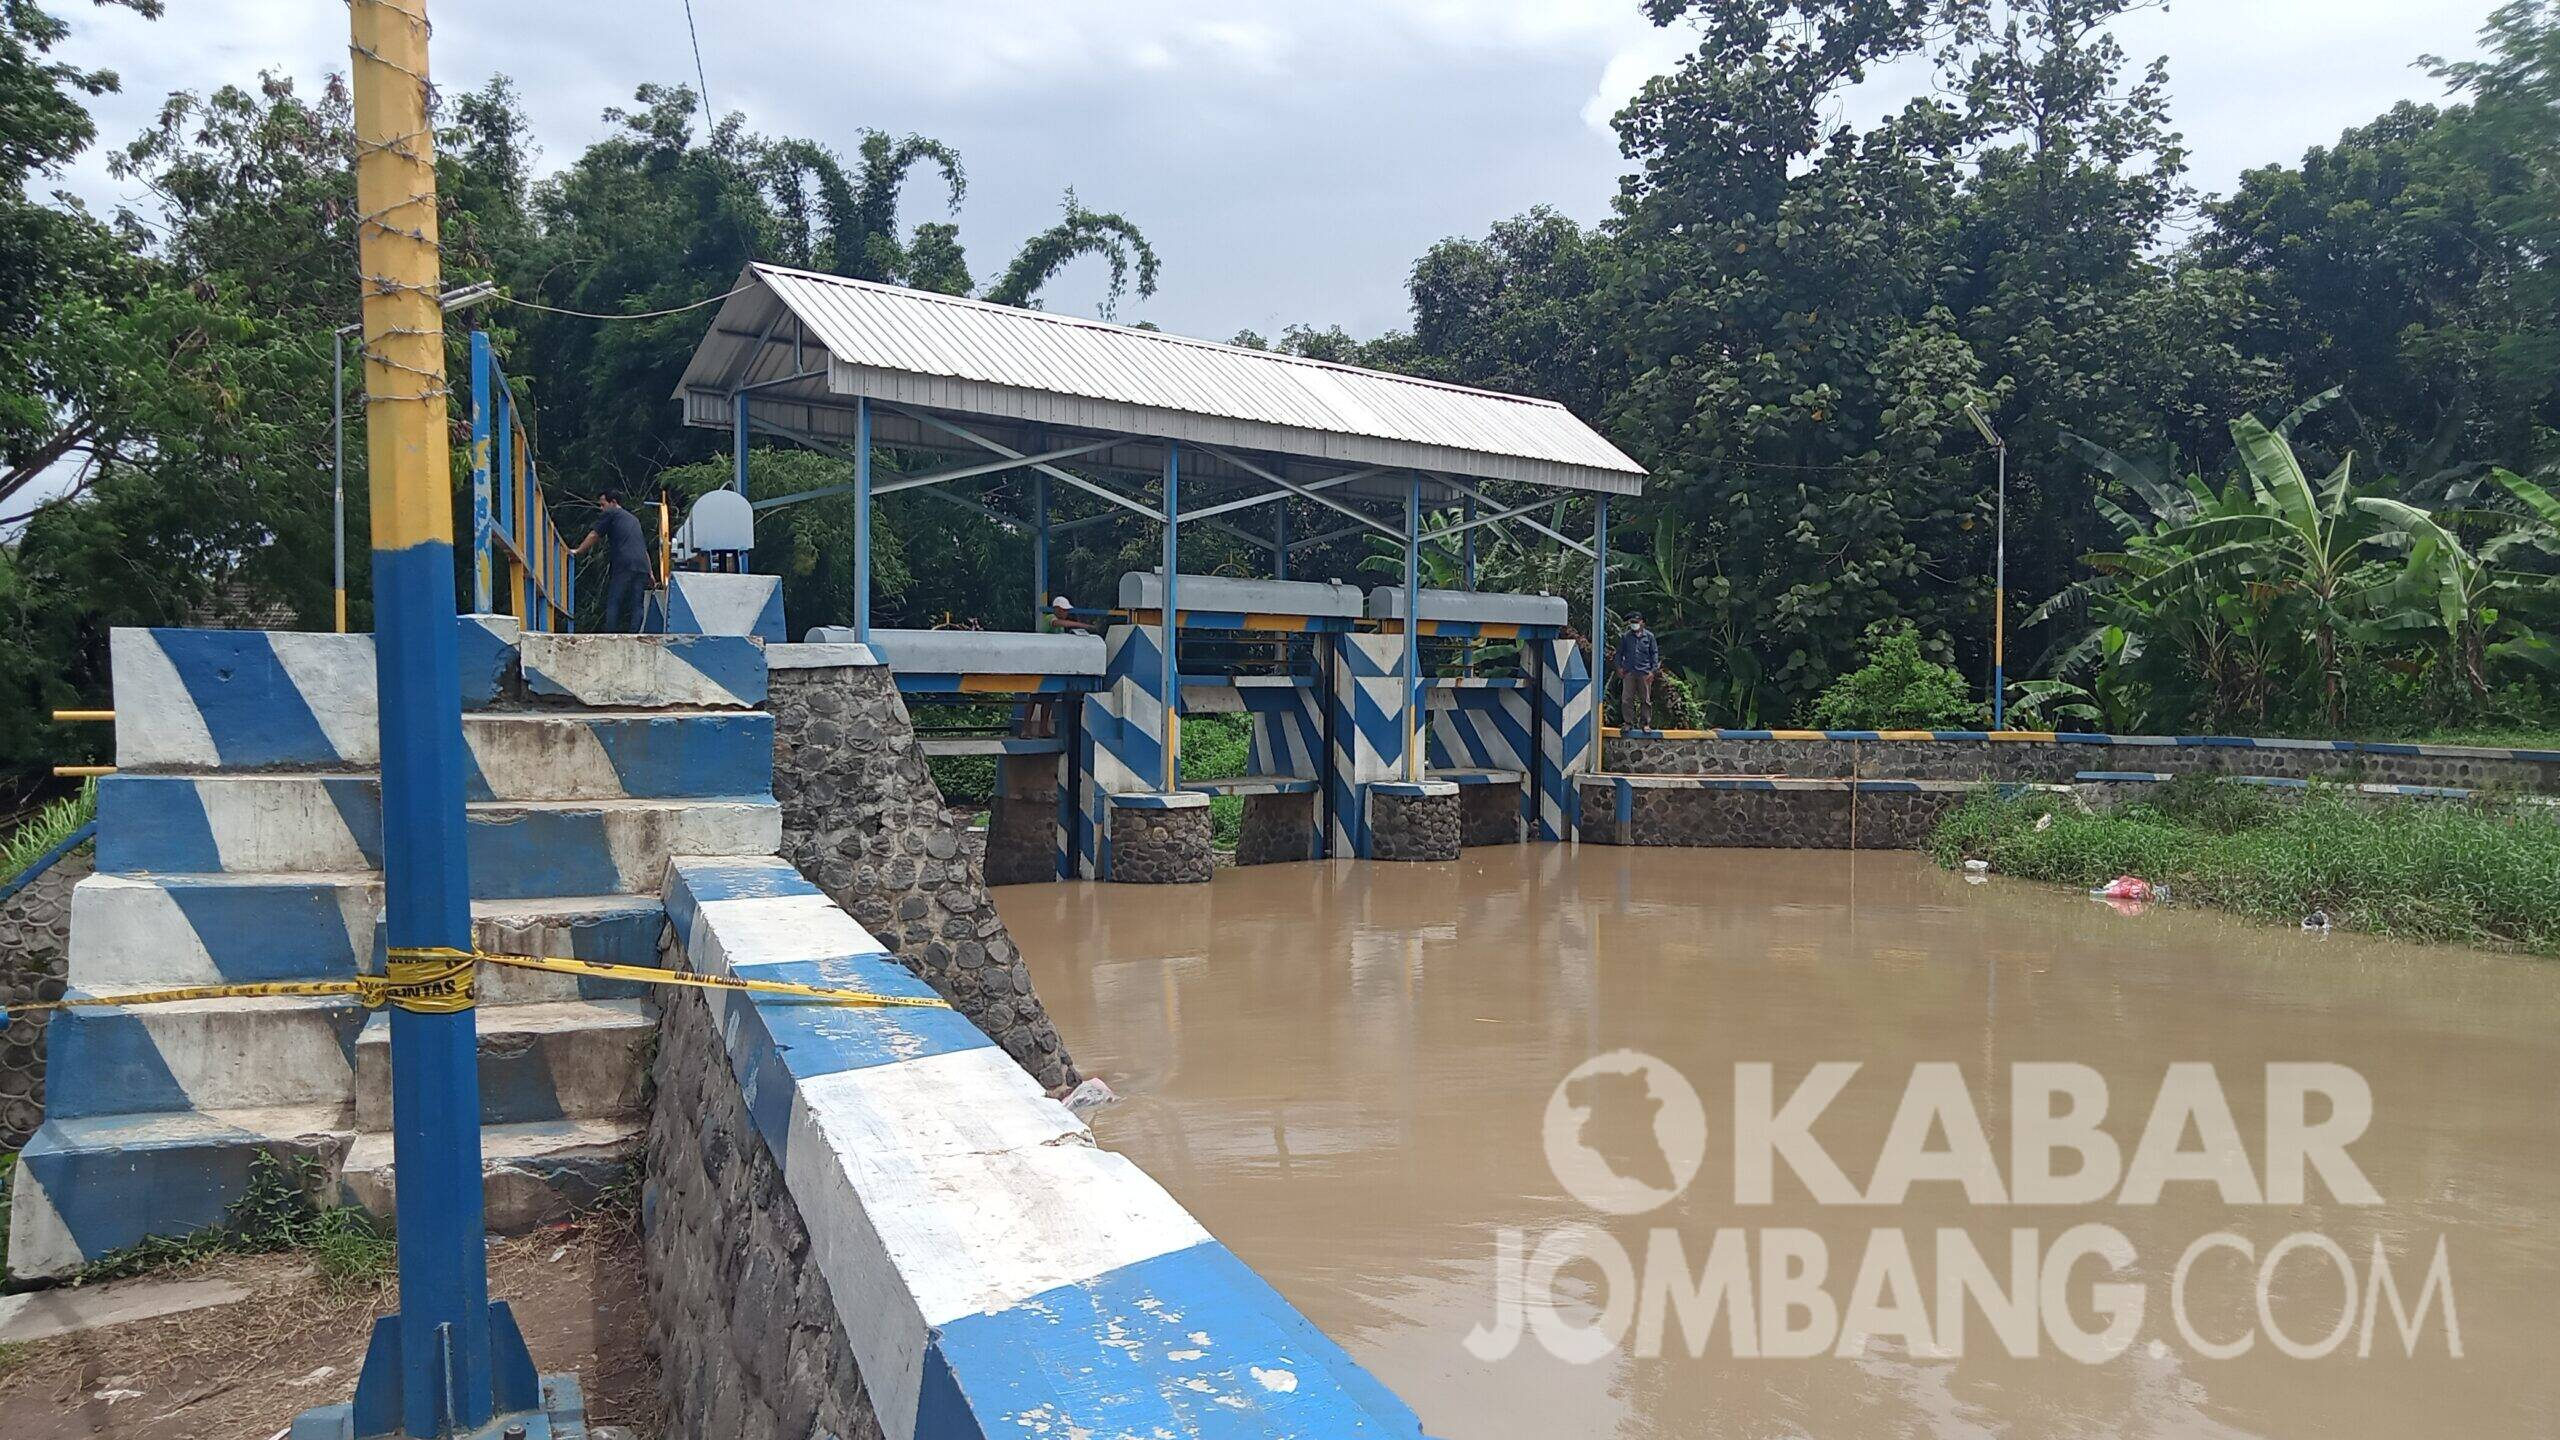 Dam Jetis Mancilan Mojoagung lokasi anak tenggelam. KabarJombang.com/Daniel Eko/